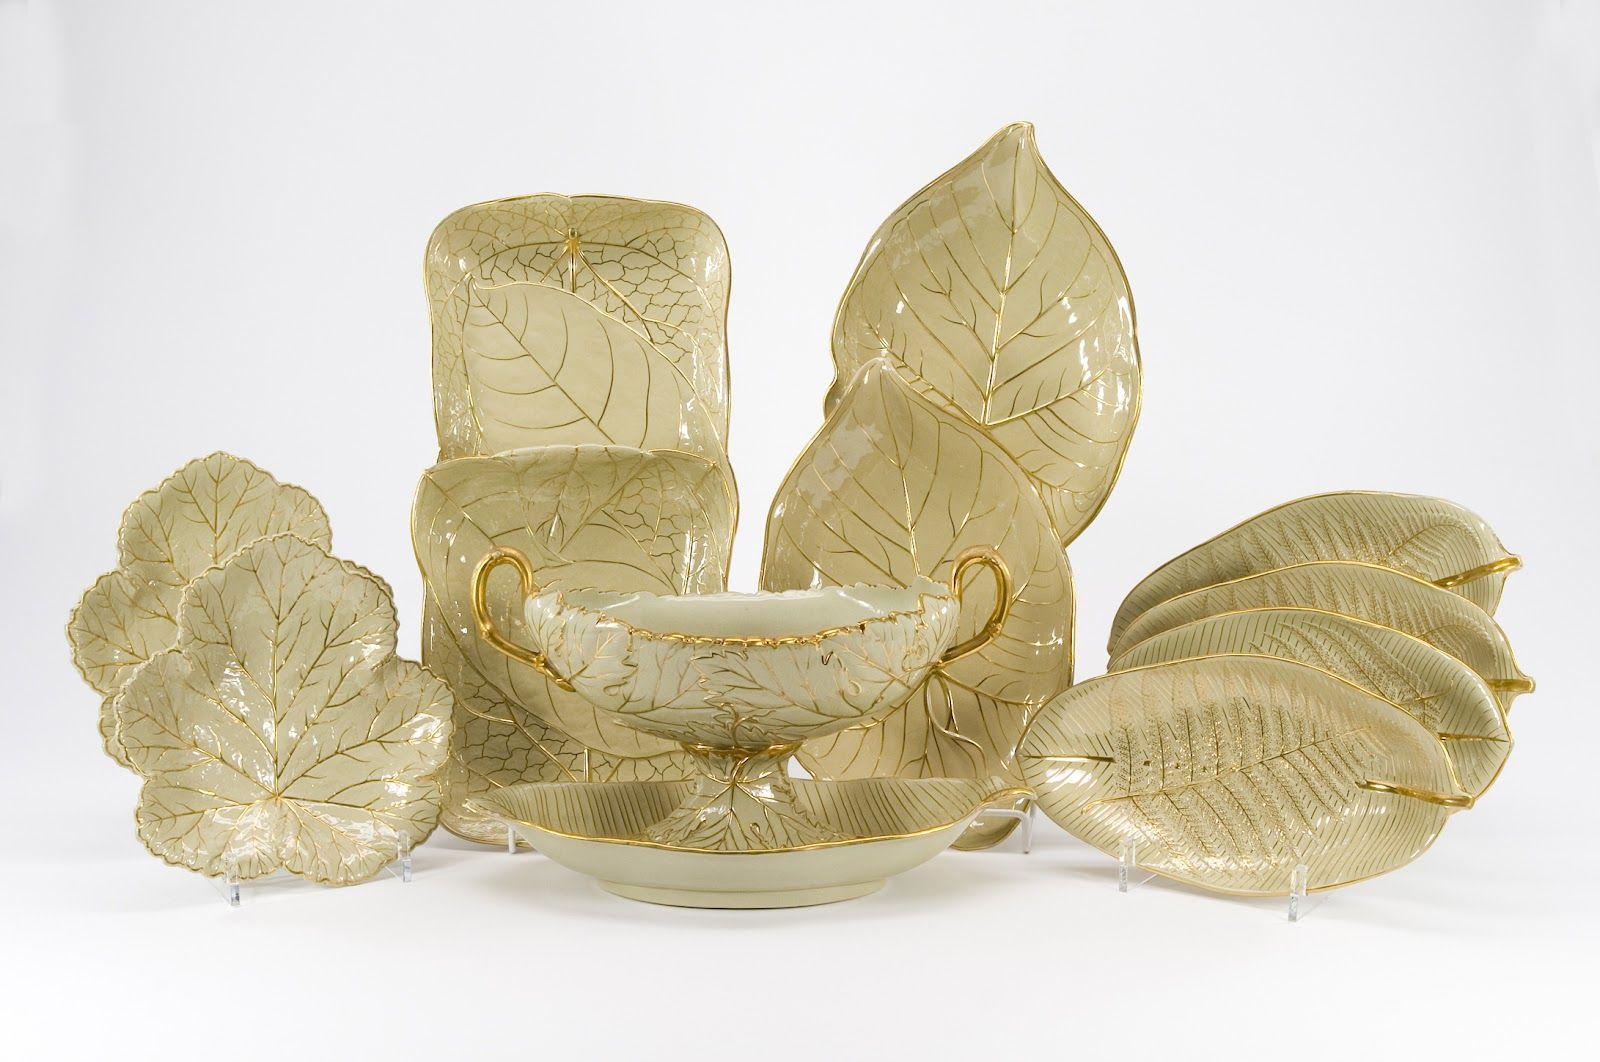 Wedgwood Drabware